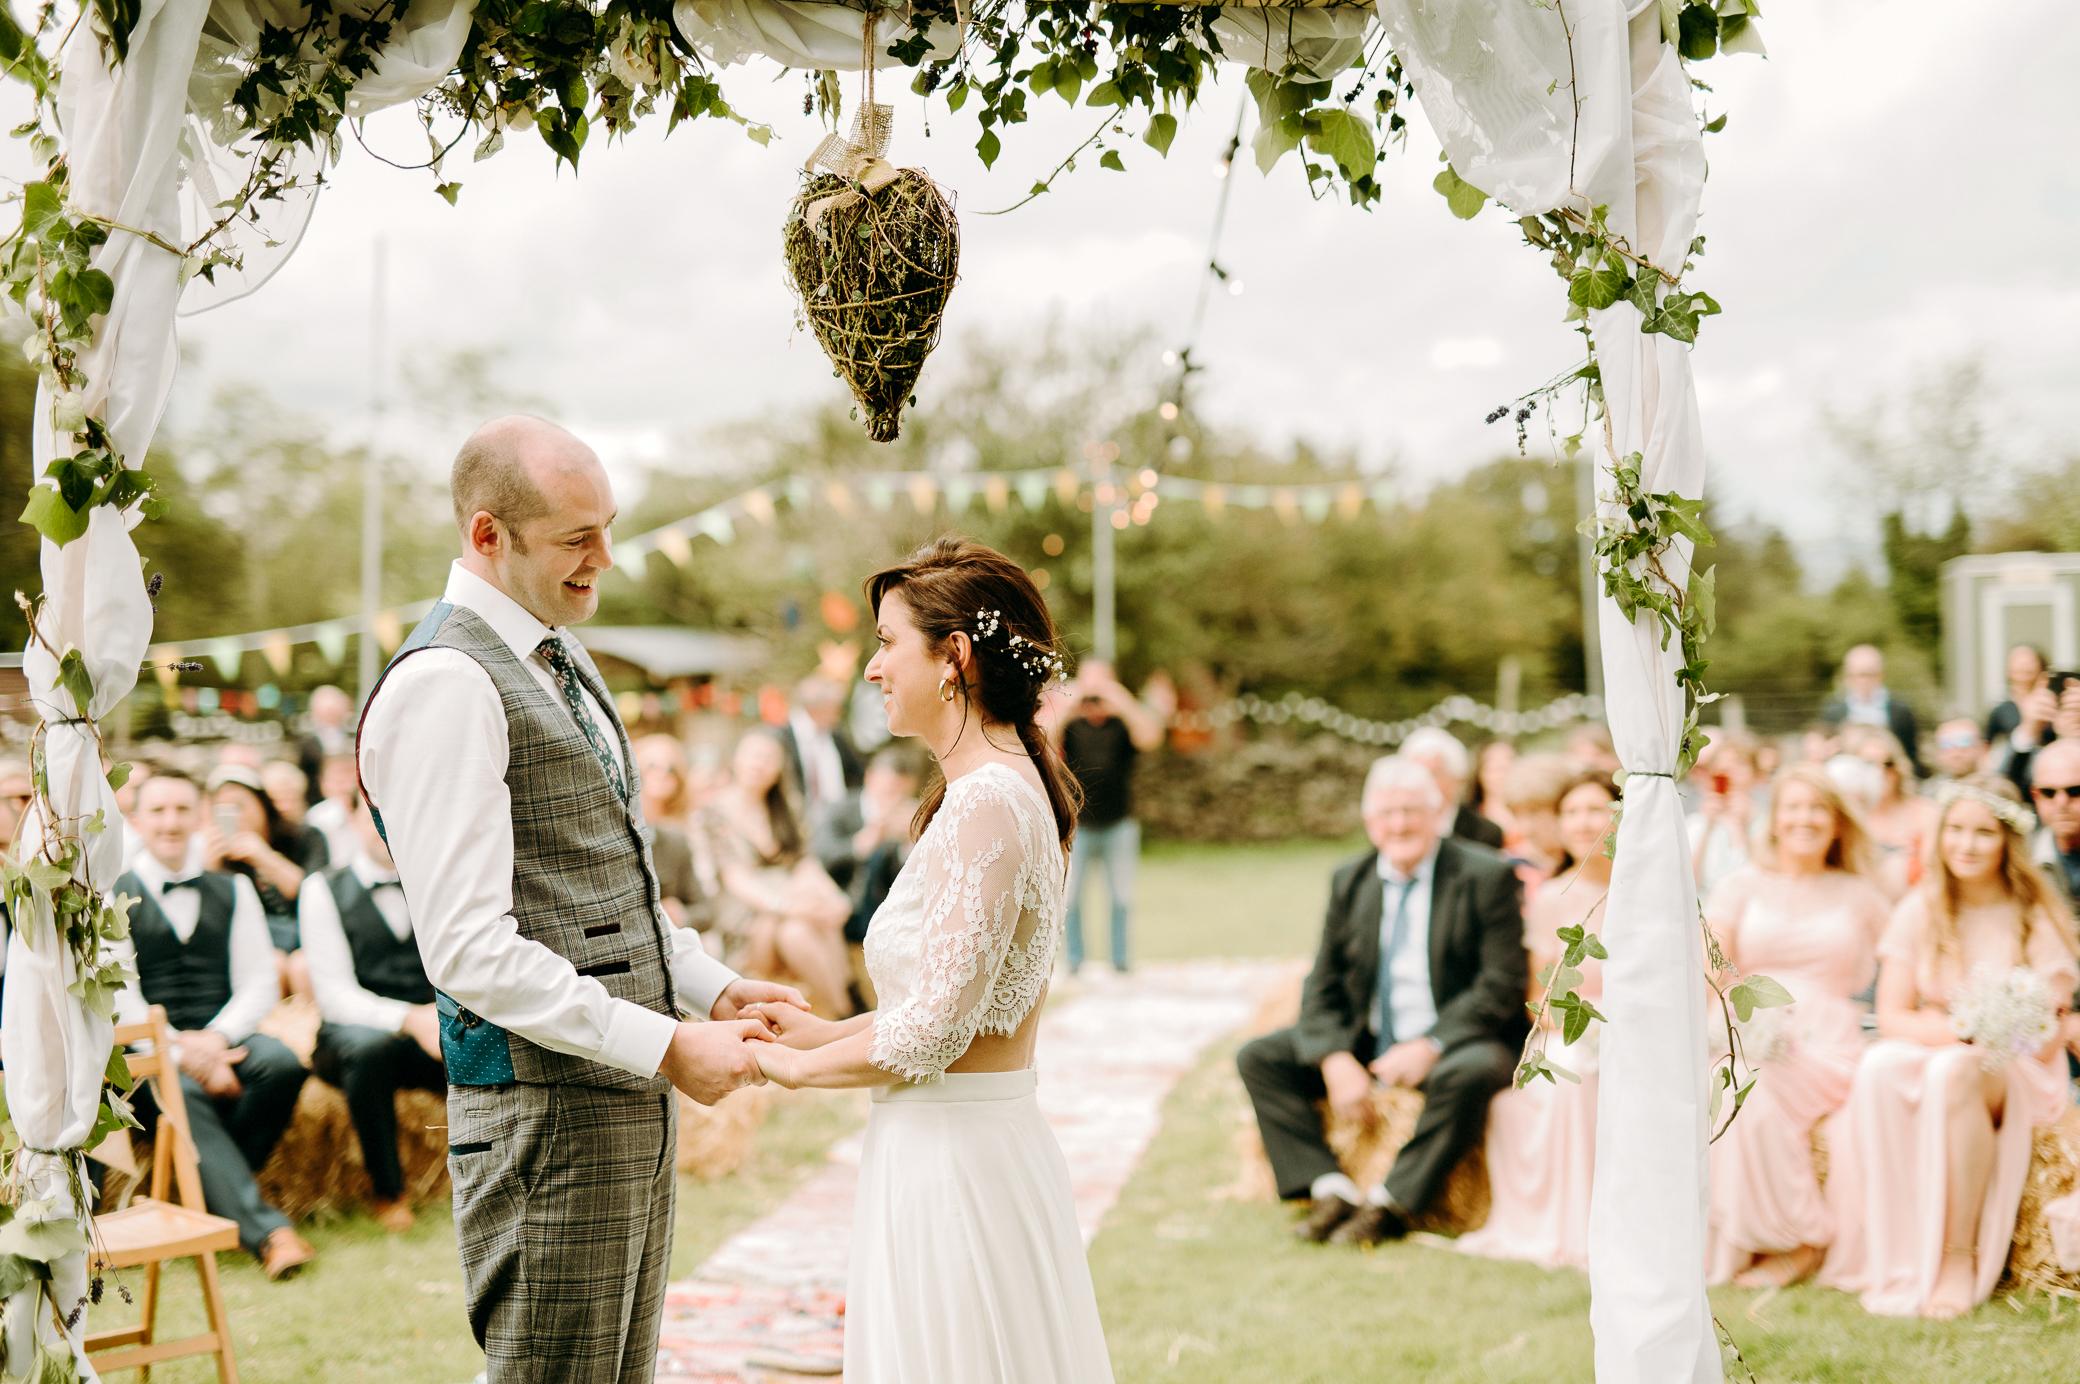 Carmel&Marcus_Wedding photographer Europe-49.jpg